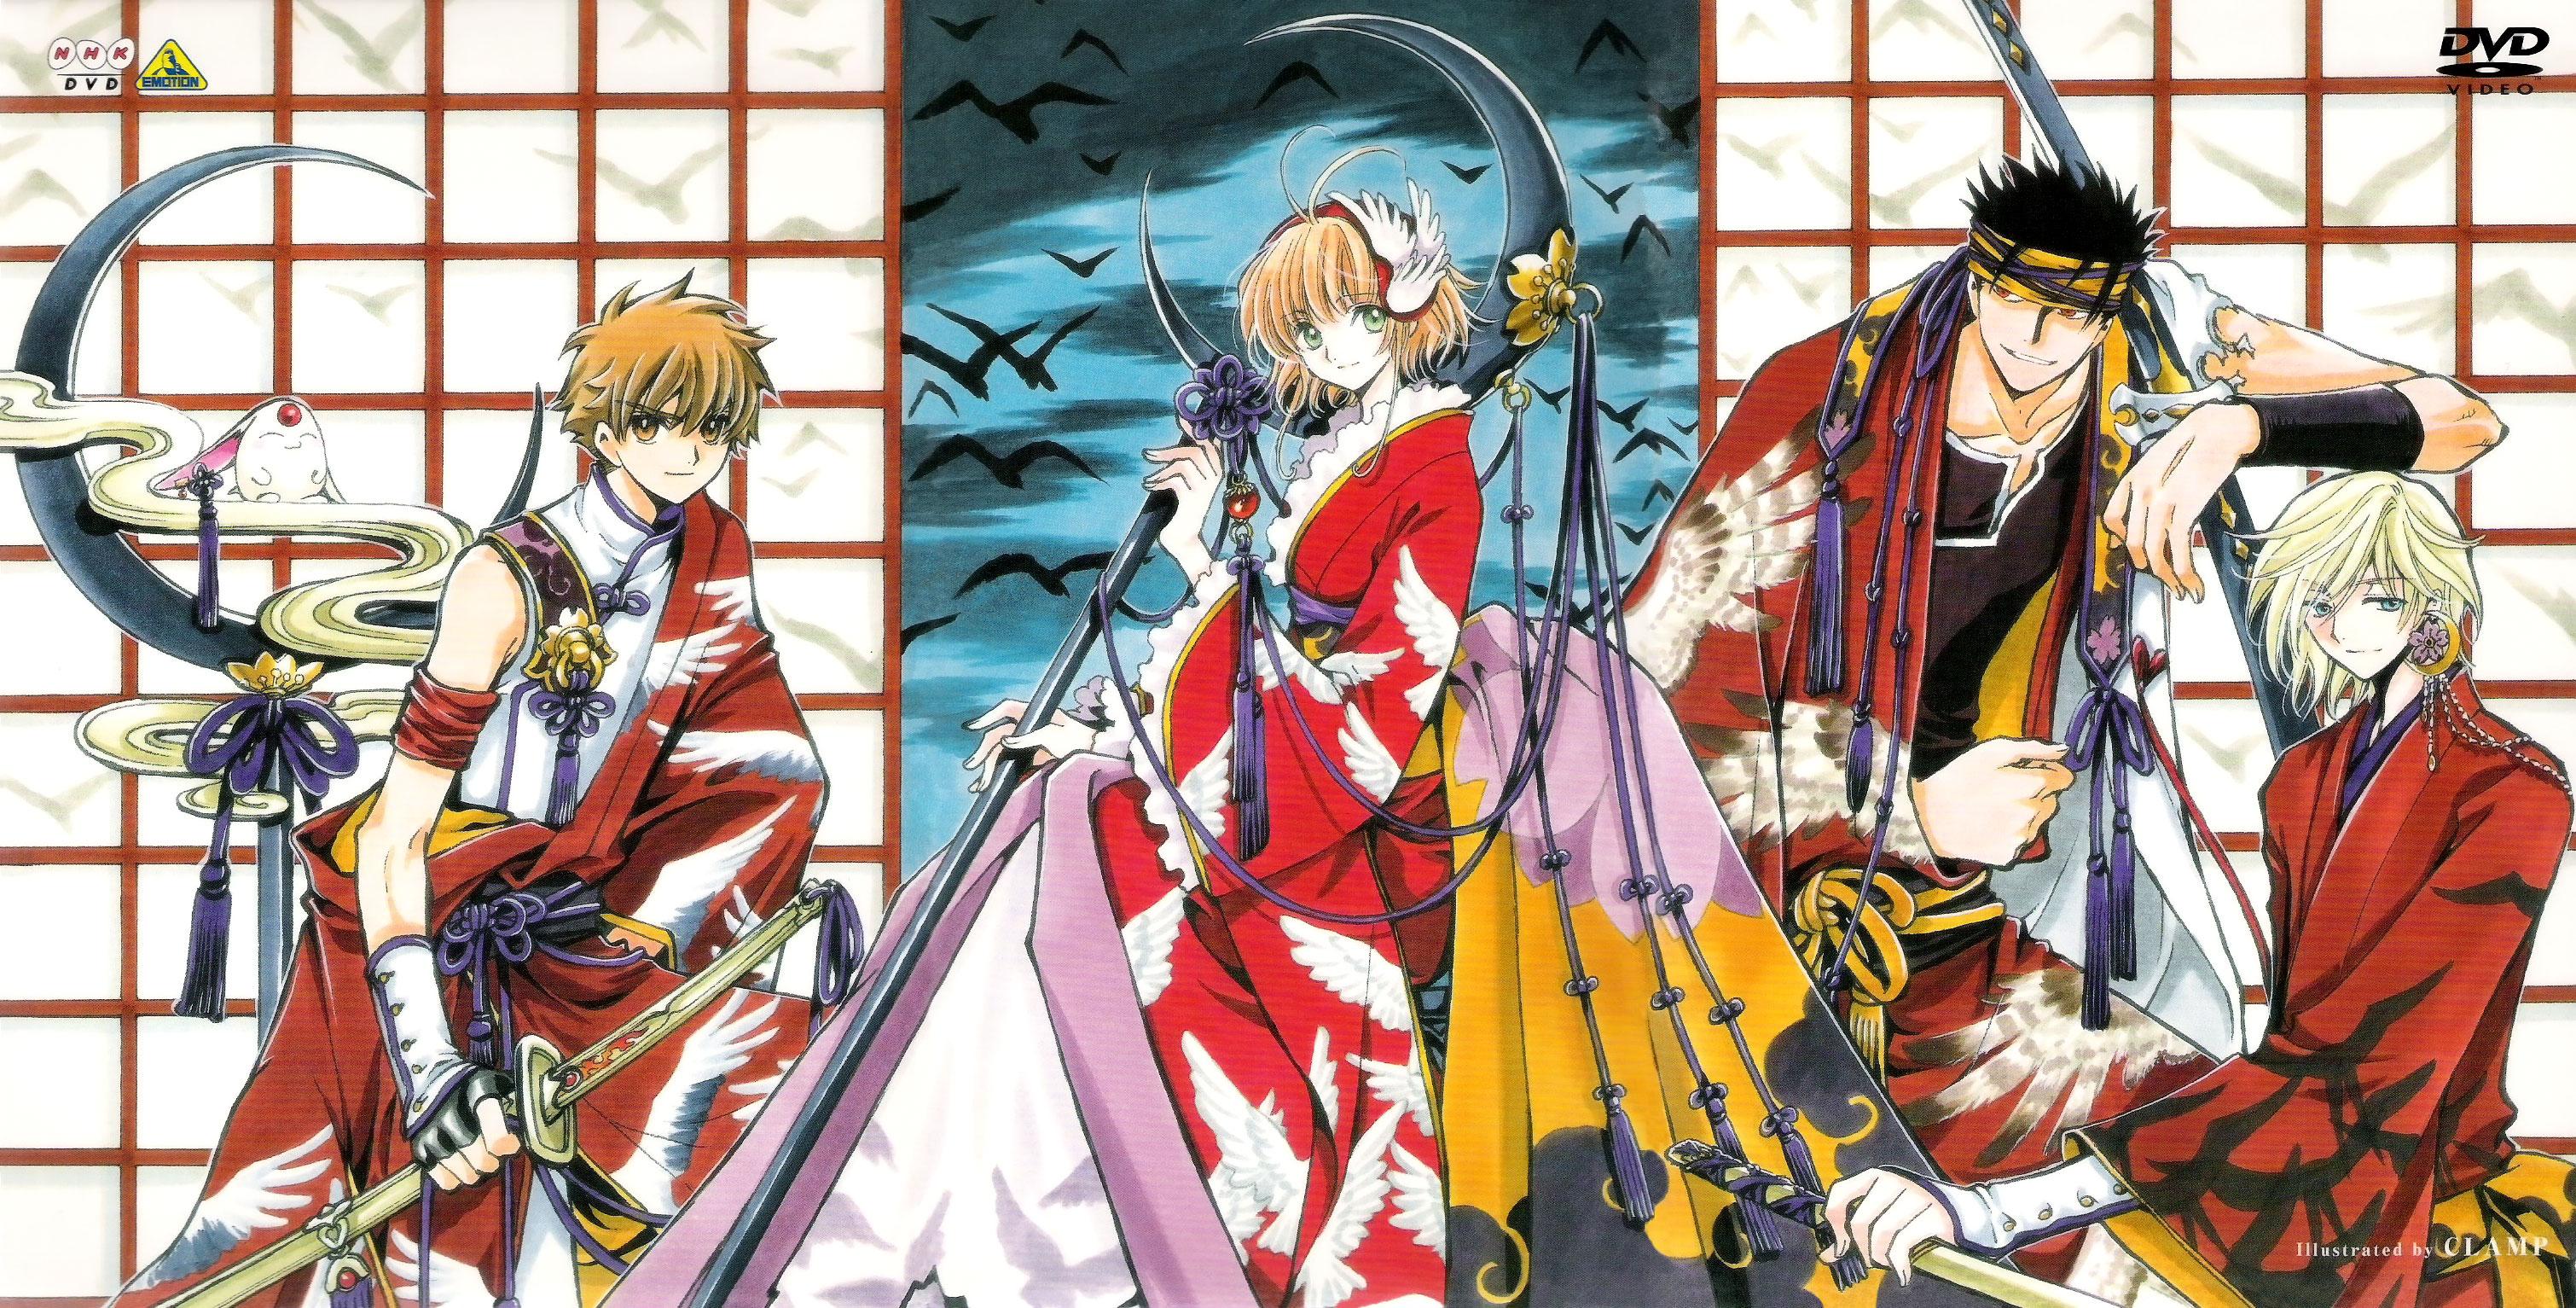 Tsubasa chronicle original soundtrack future soundscape iii mp3.